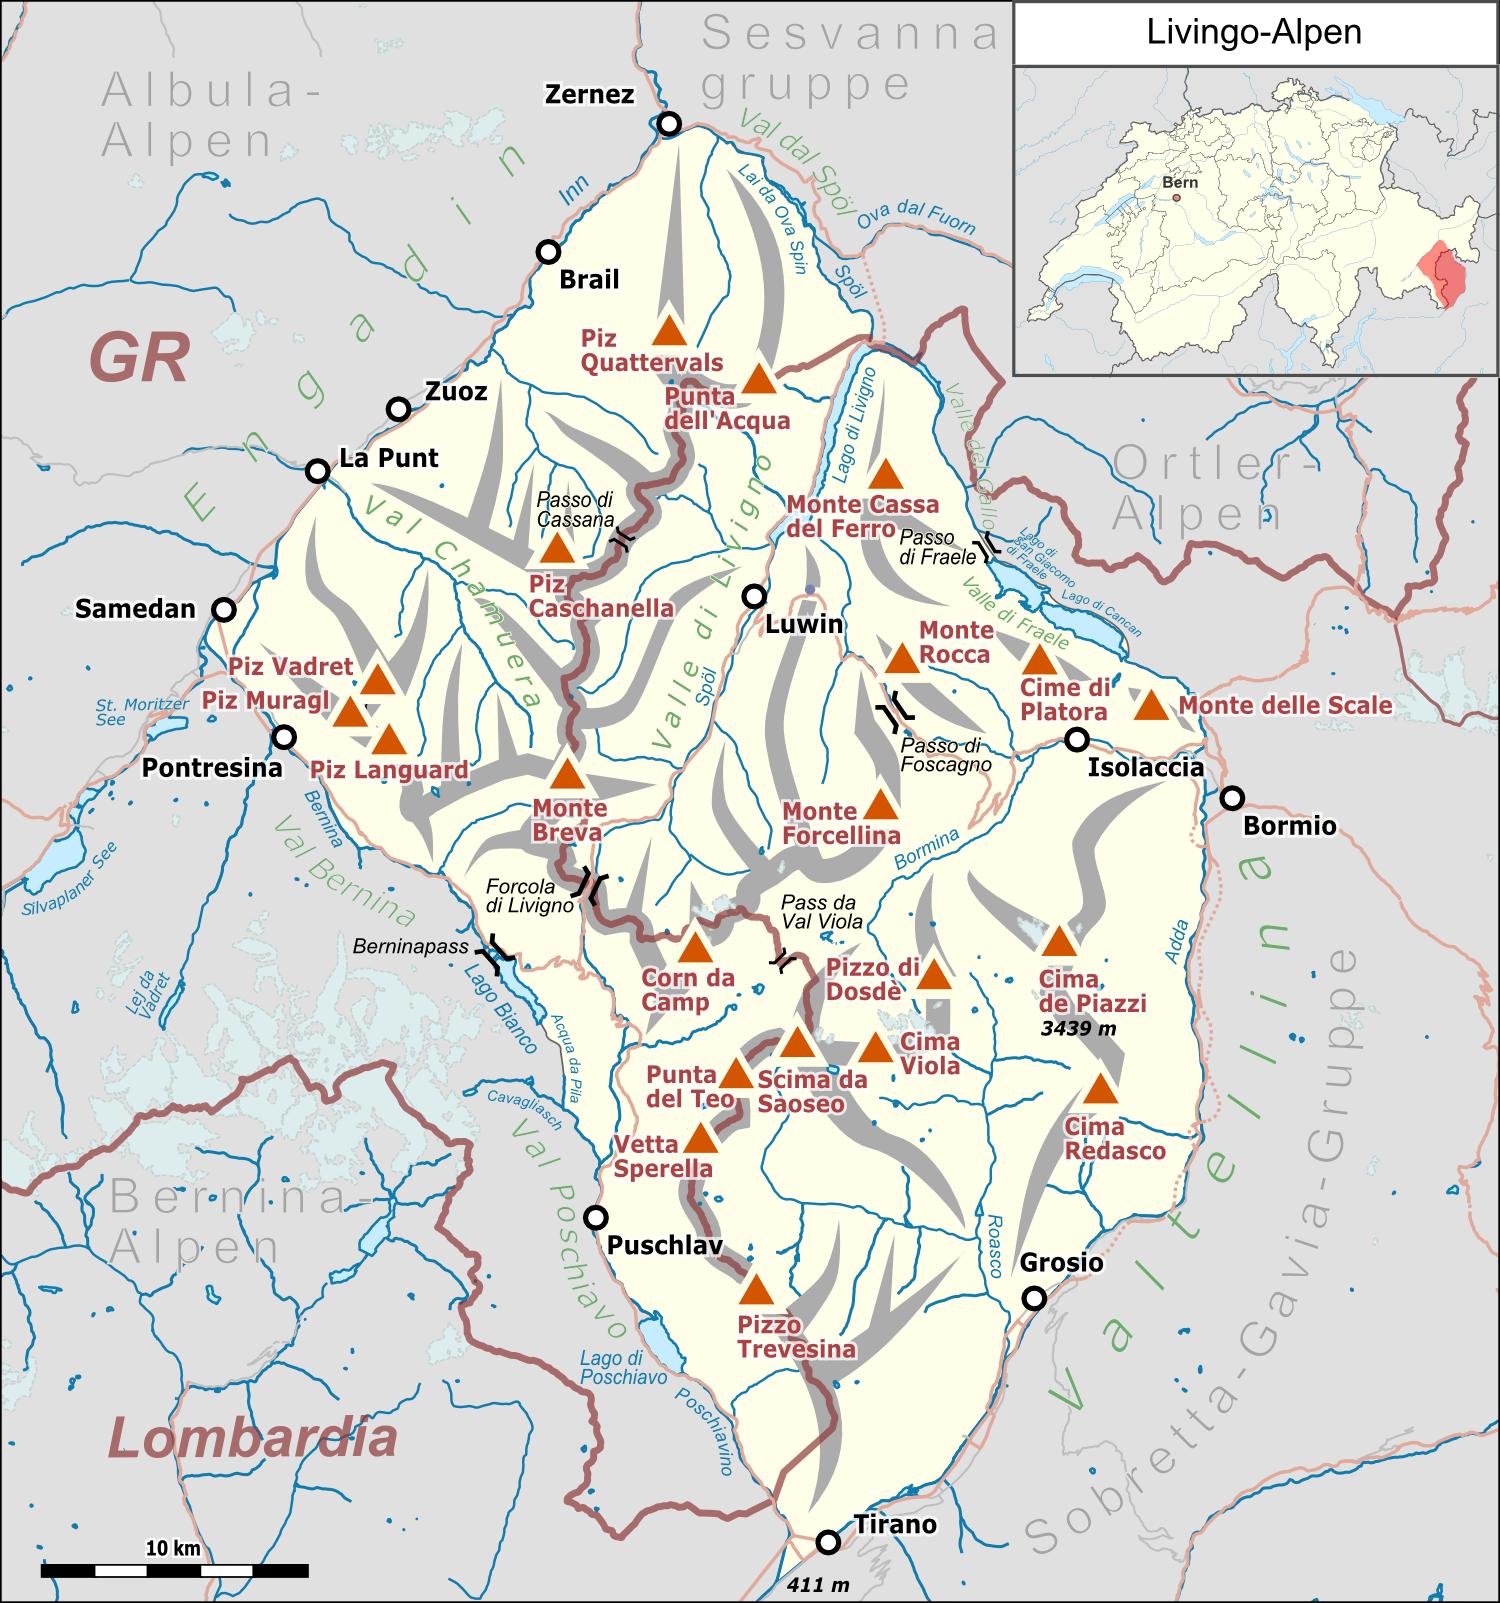 livigno karte italien Livigno Alpen – Wikipedia